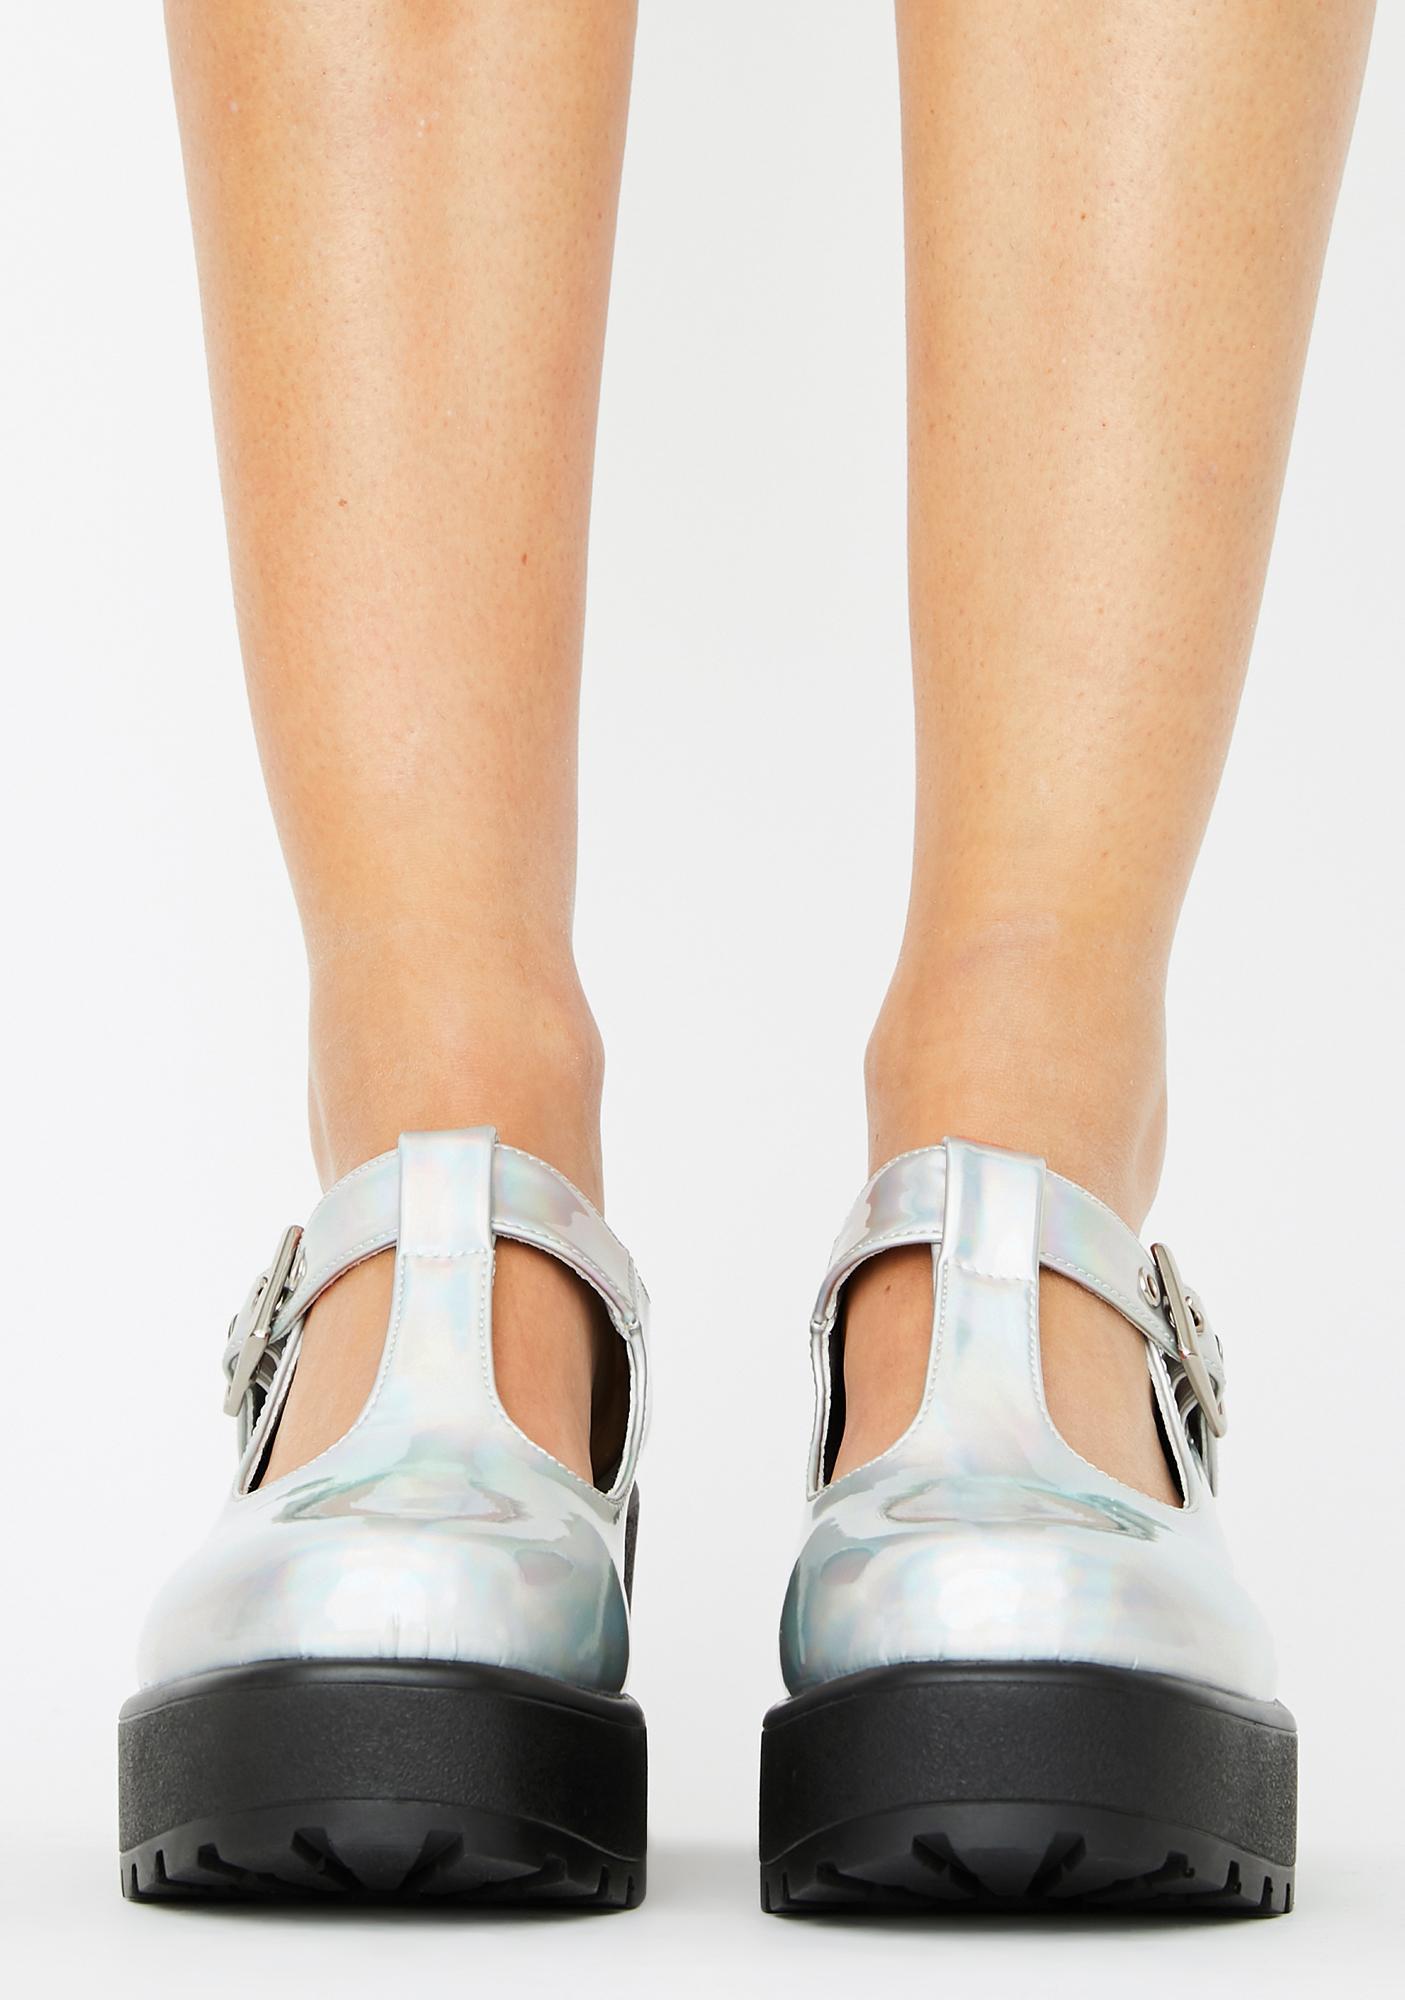 Koi Footwear Sai Holographic Mary Janes